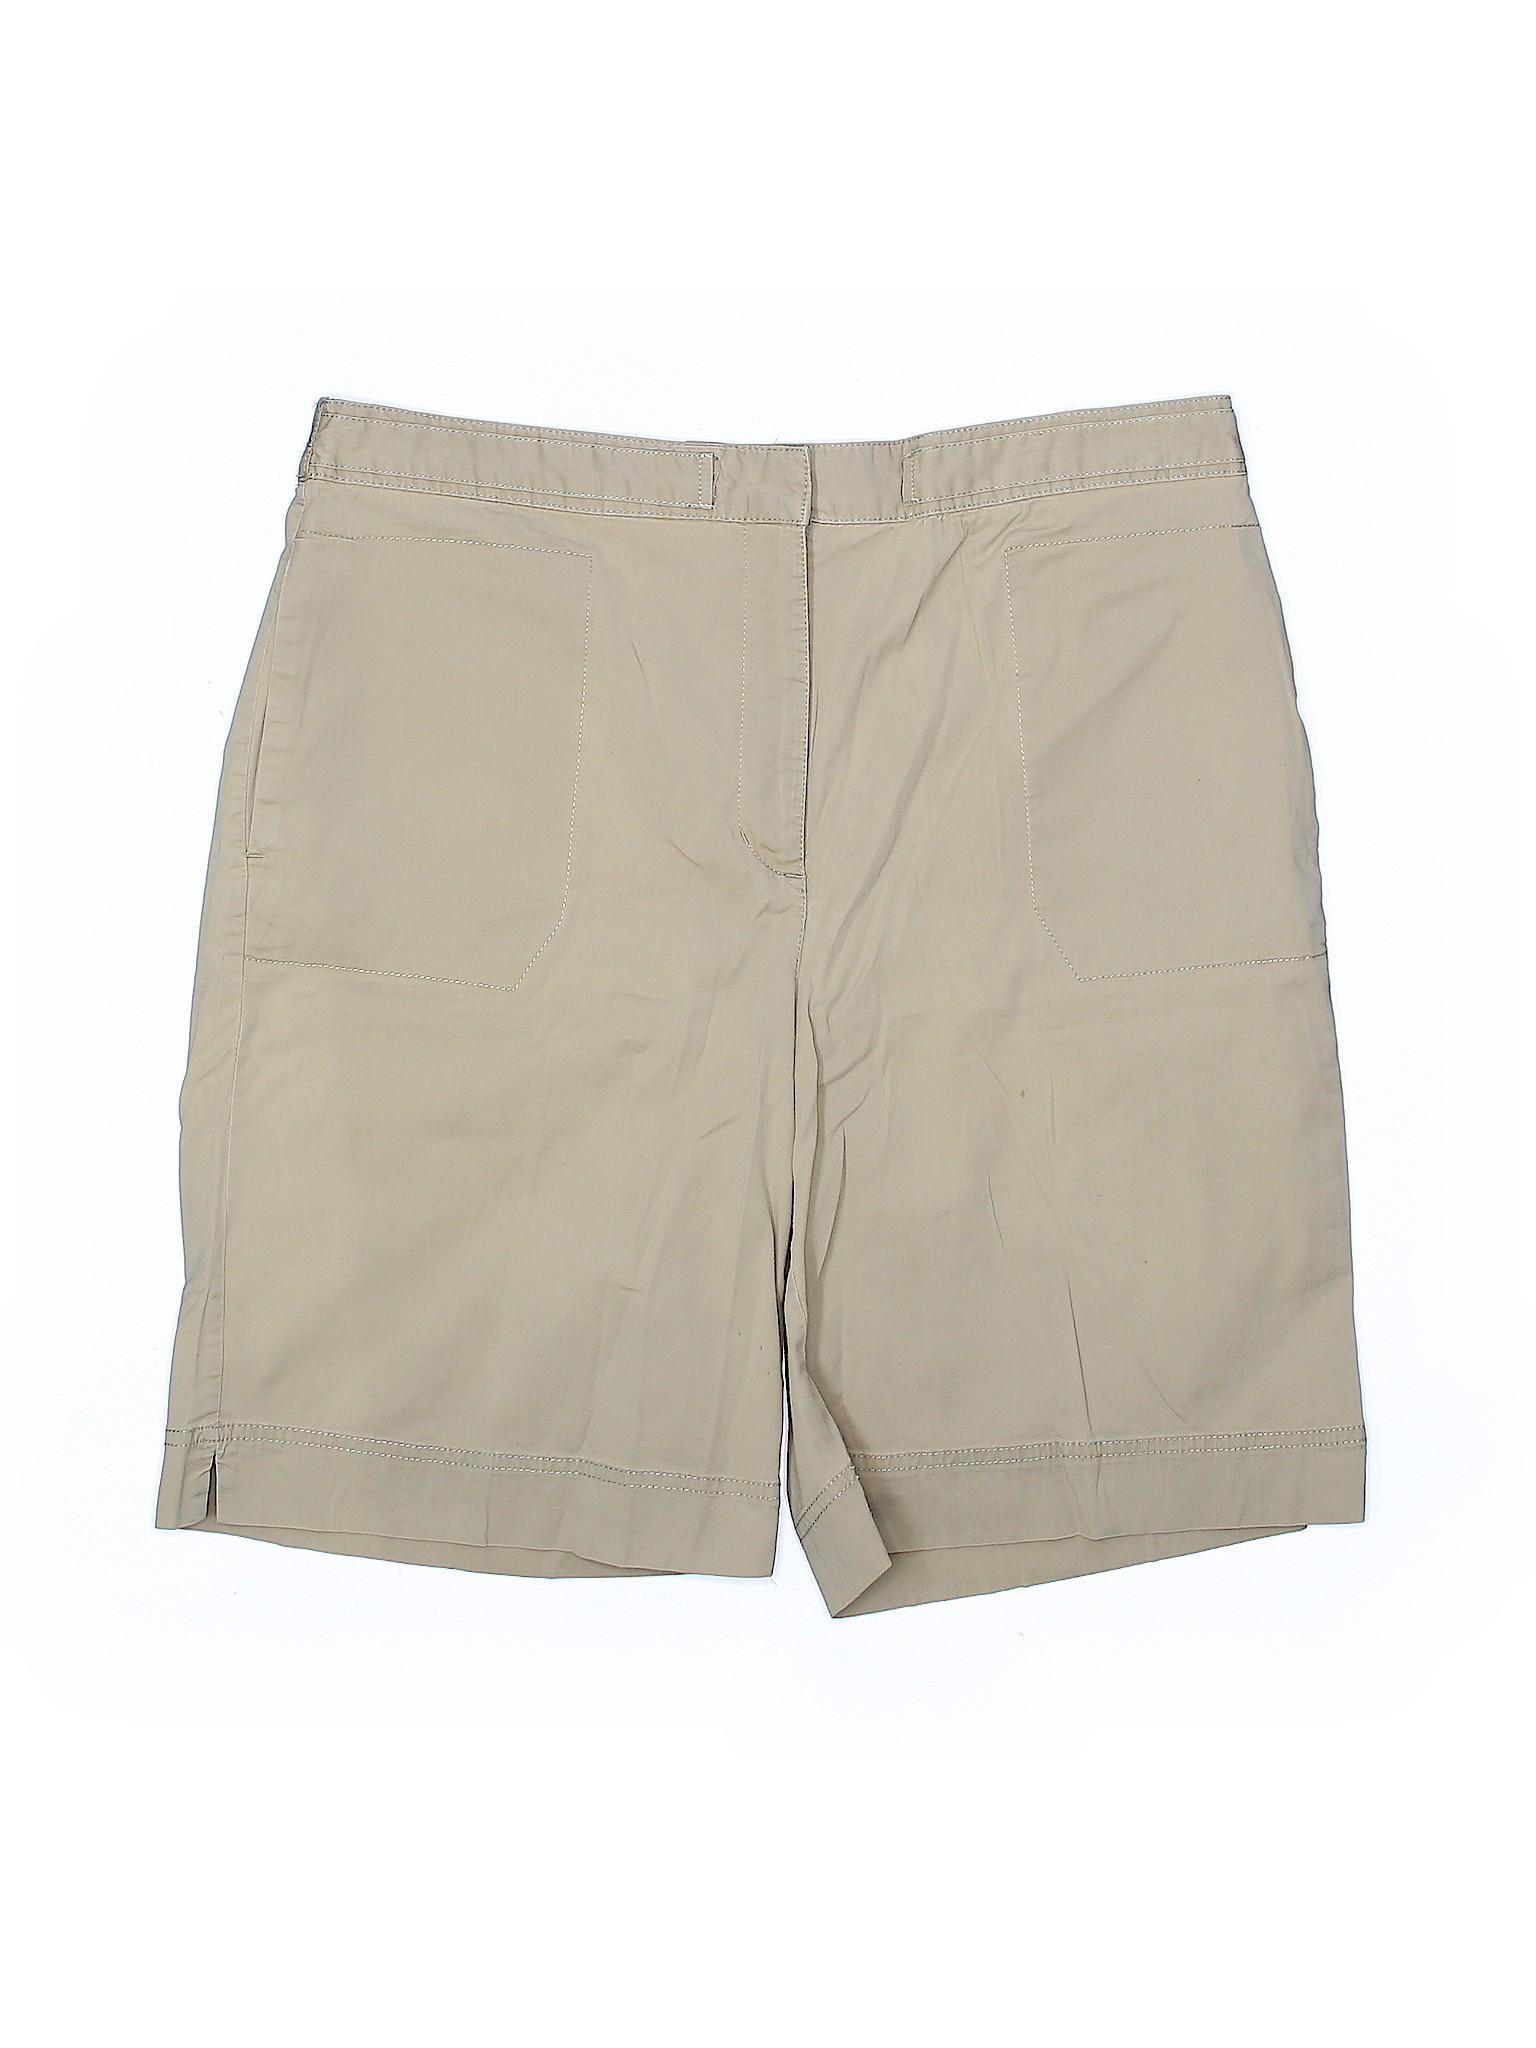 Boutique Shorts Boutique Karen Scott Karen Khaki Khaki Boutique Shorts Scott pzqWX